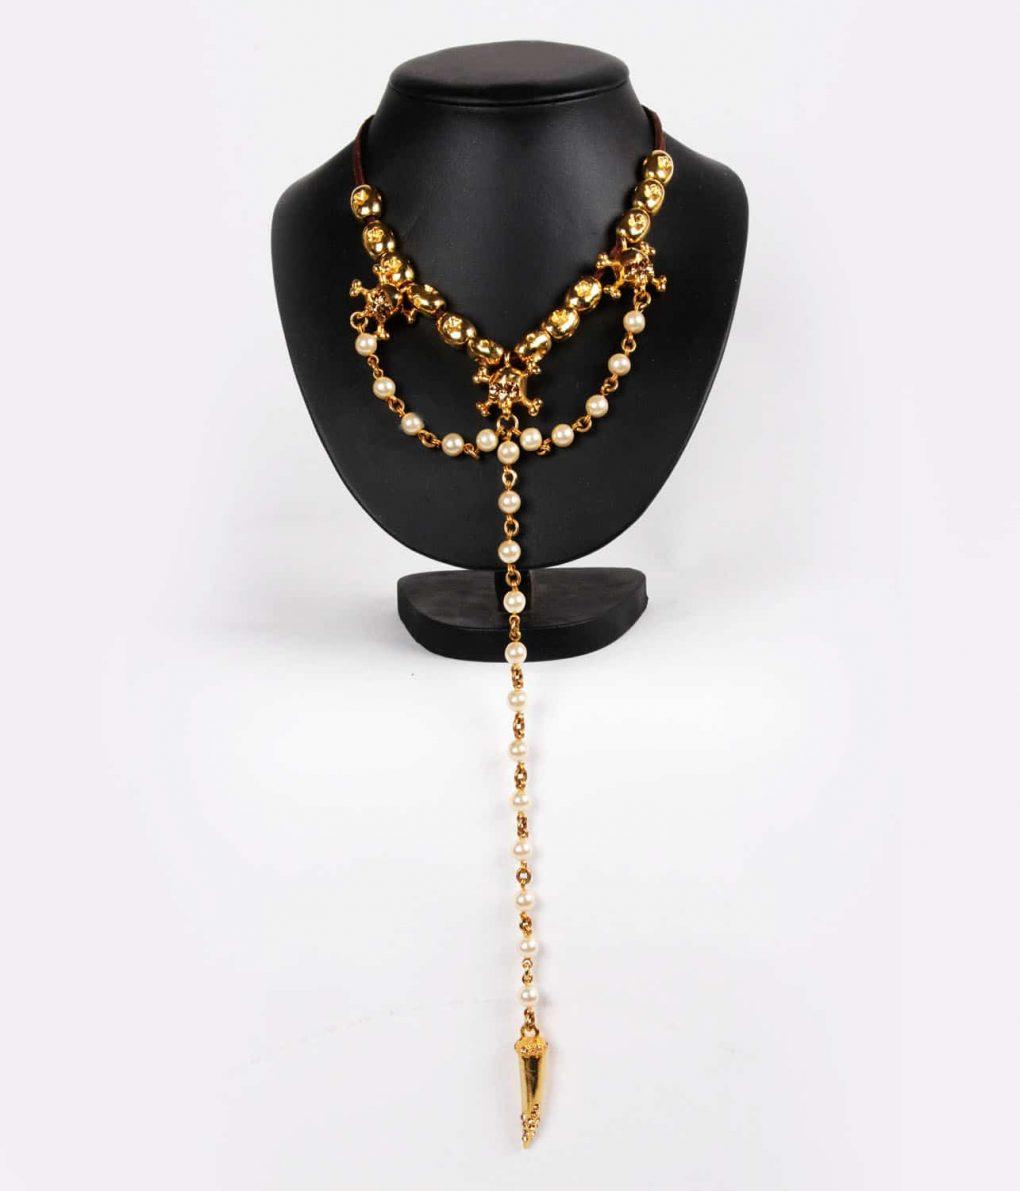 Alila Otazu Gold Skull Long Rosary Necklace